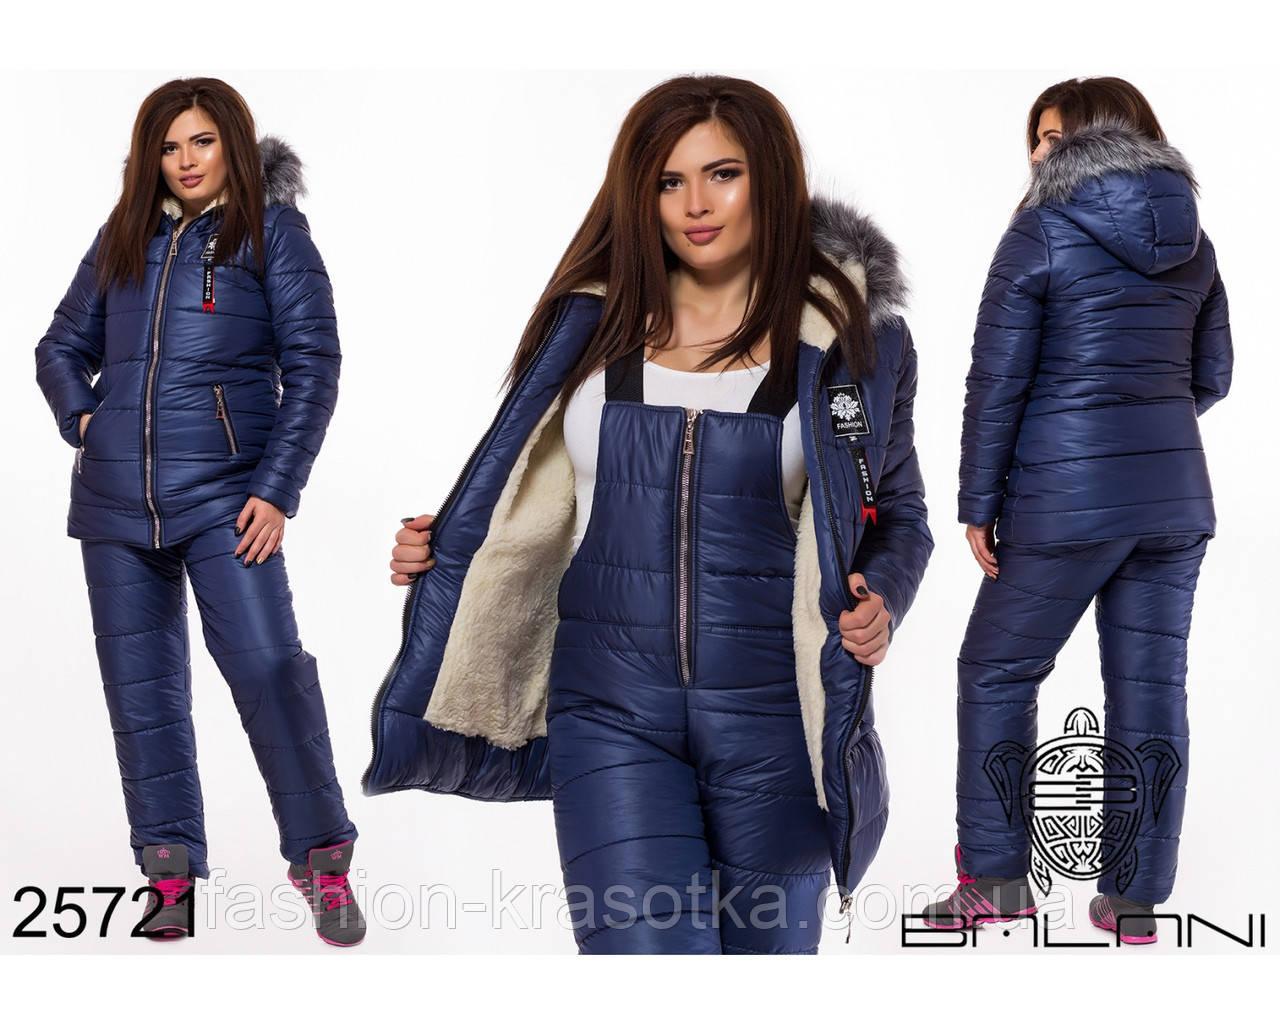 Лыжный костюм:куртка+ комбинезон,размеры 48-50,52-54,56-58.